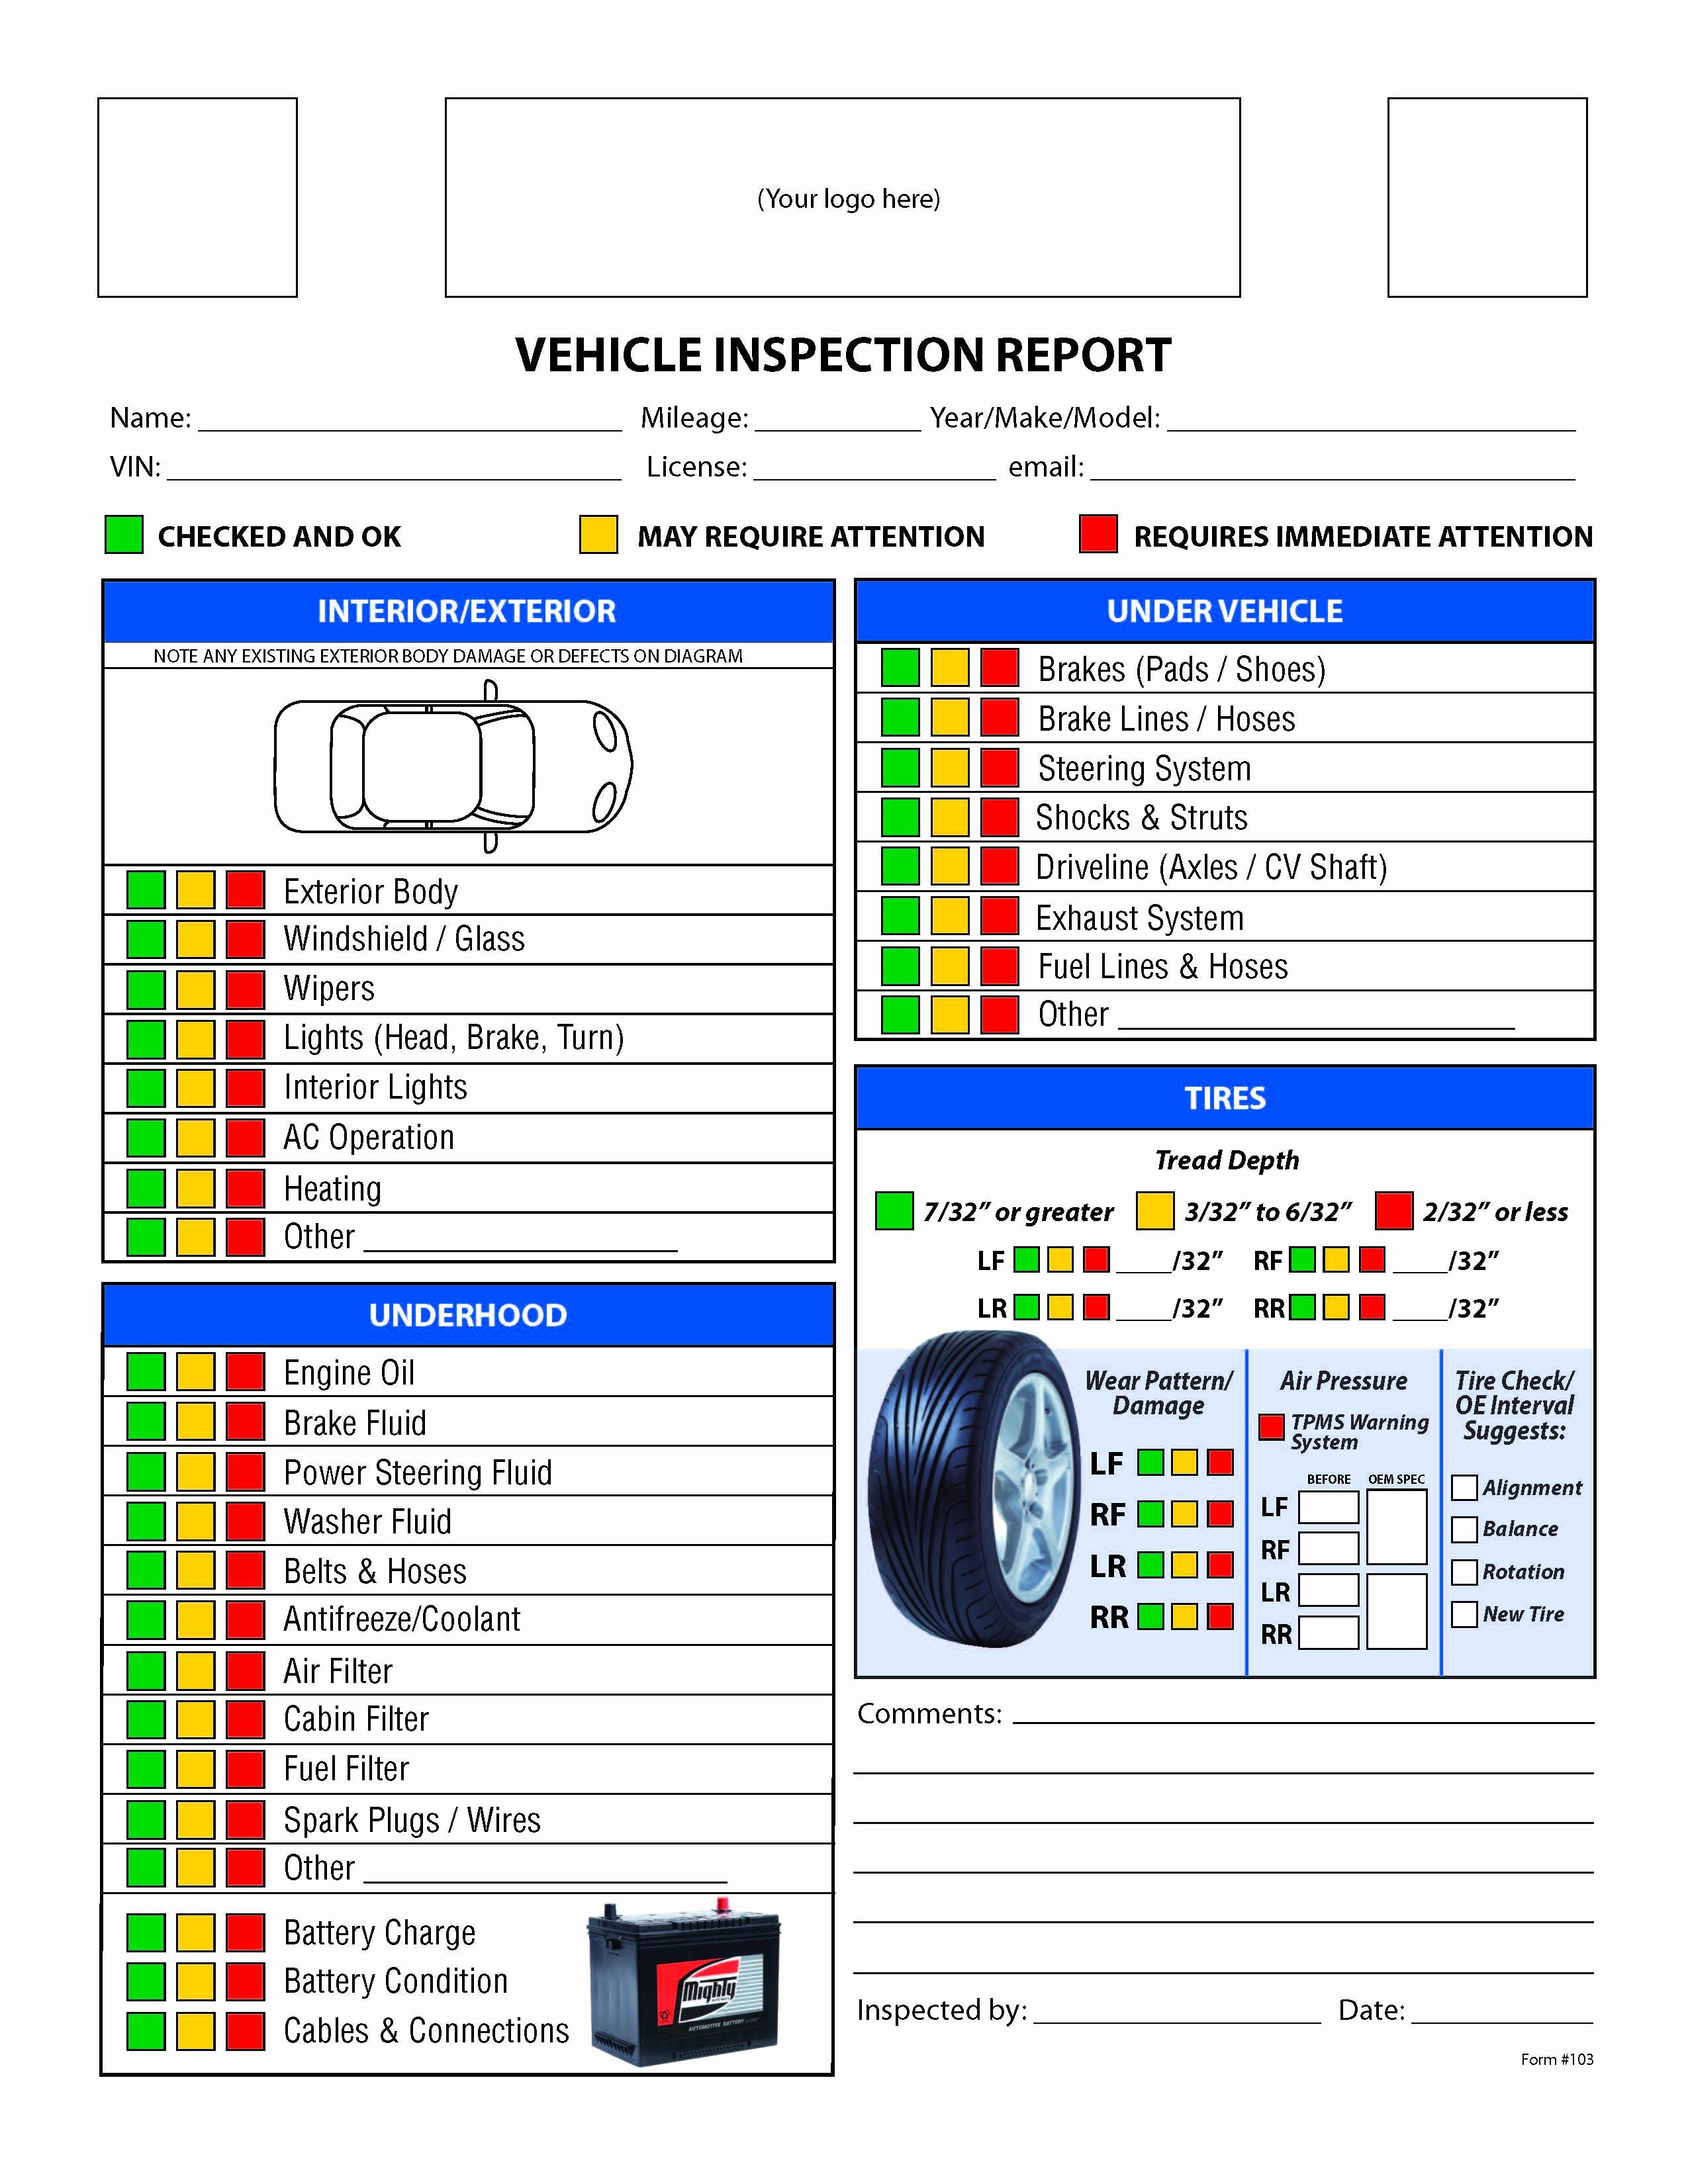 Vehicle Maintenance Checklist Template Elegant Free Vehicle Inspection Checklist form